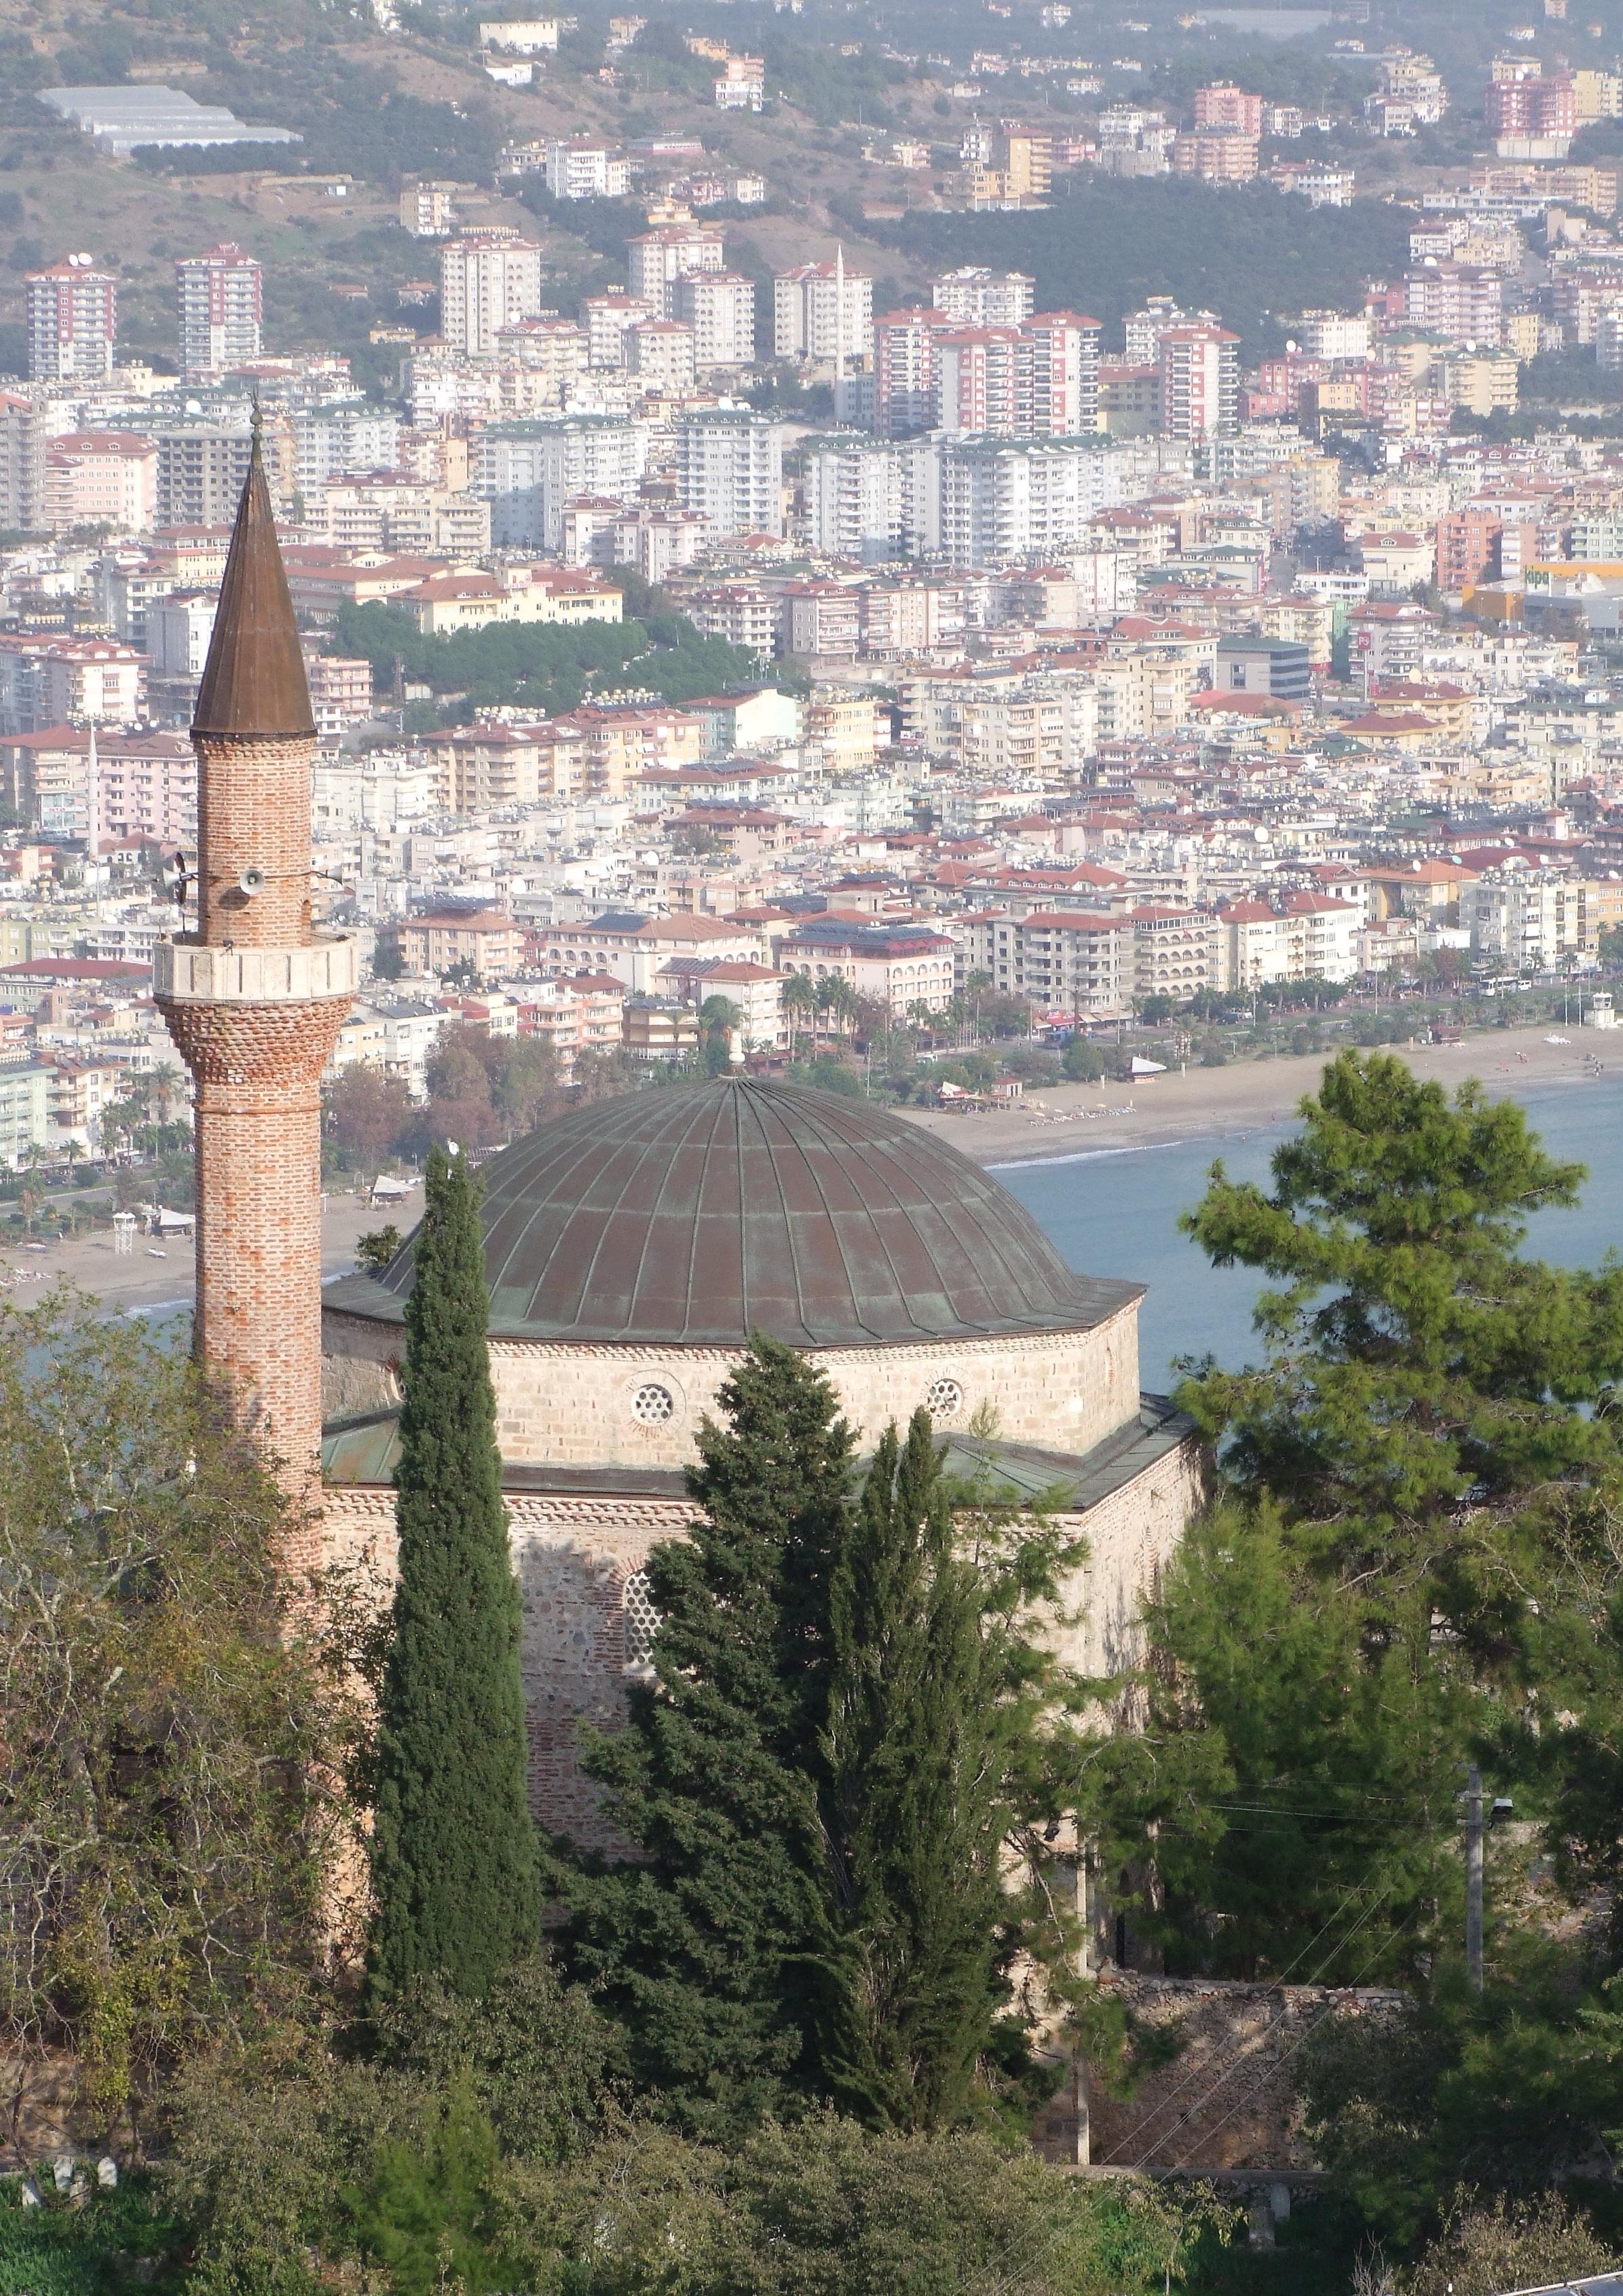 Alanya Turkey  City pictures : ... :Süleyman Mosque as seen from Alanya Castle Hill, Alanya, Turkey